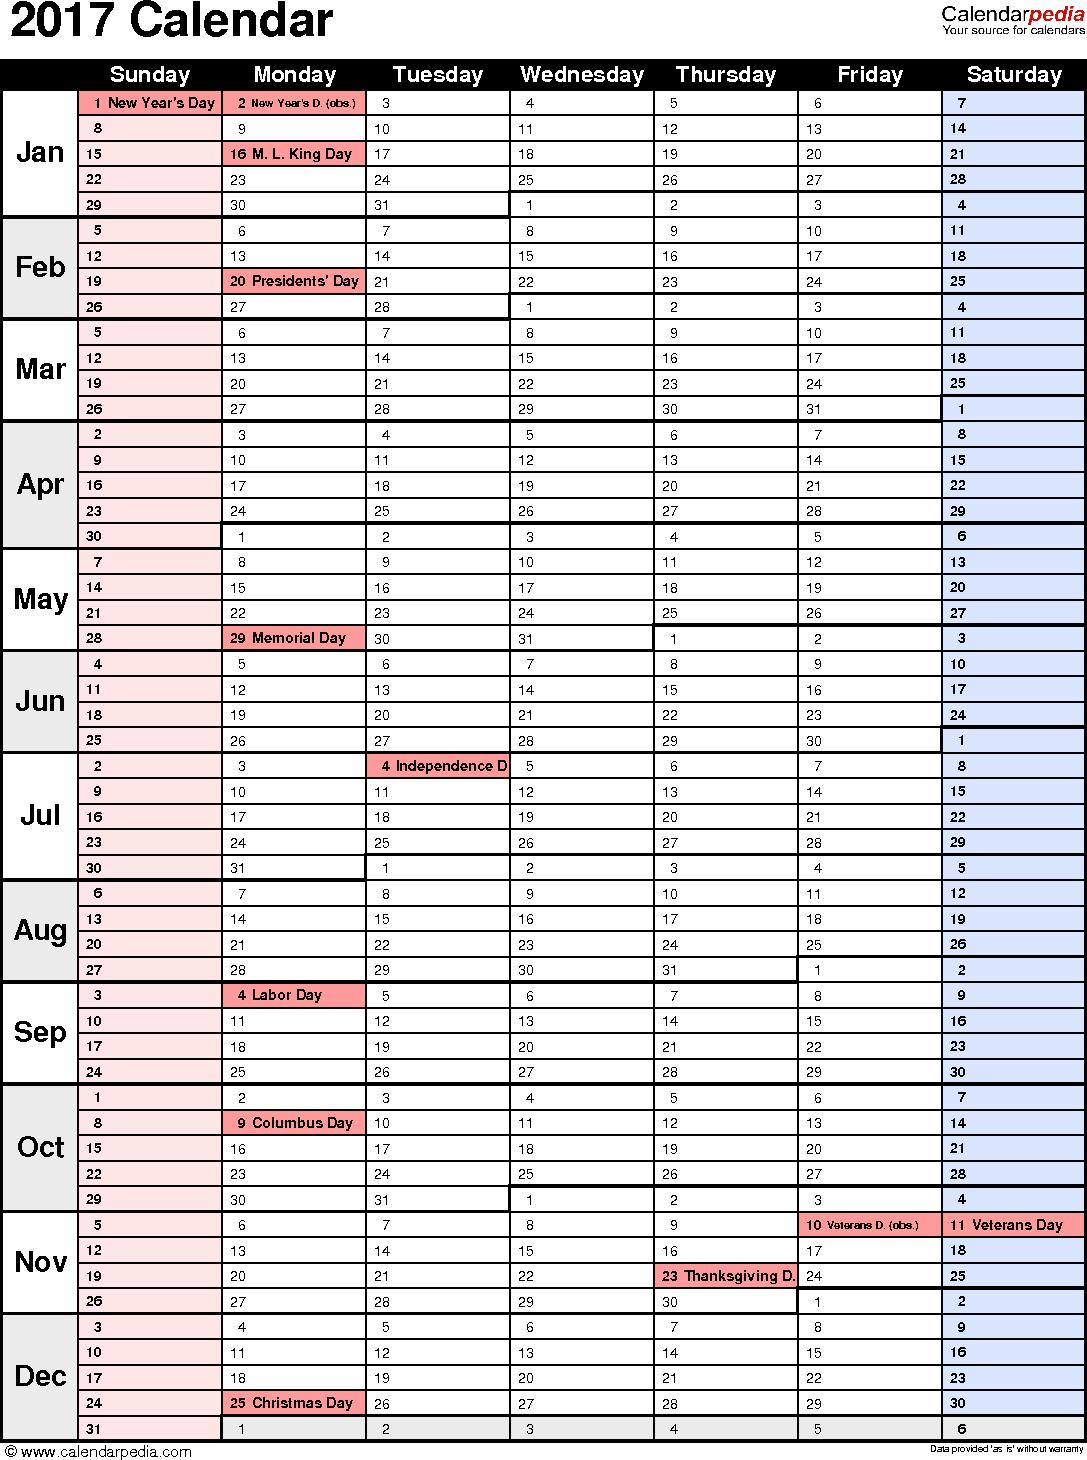 2017 Calendar Planner | 2017 calendar with holidays